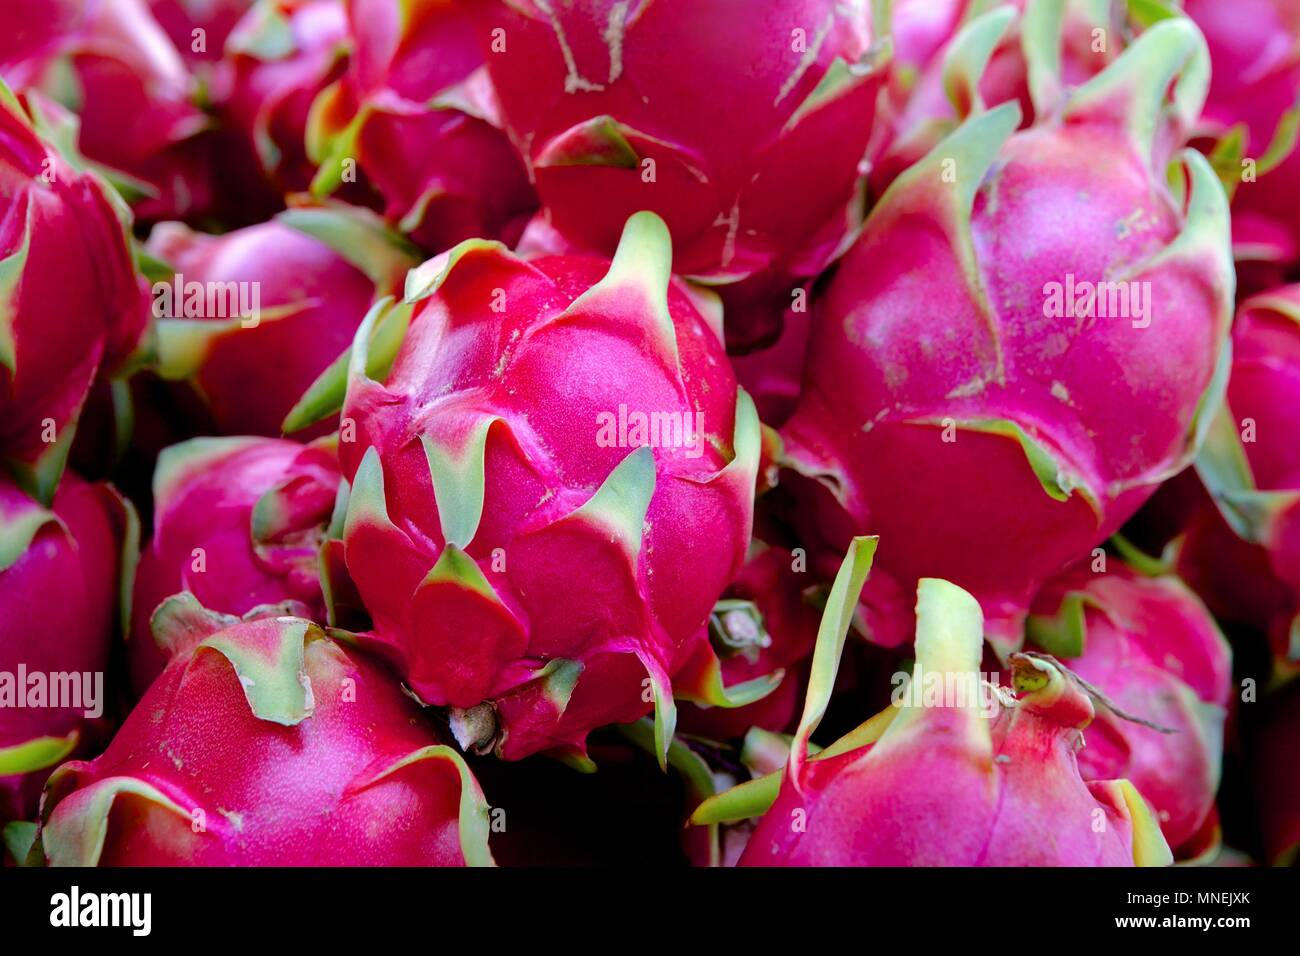 Dragon fruit - Stock Image